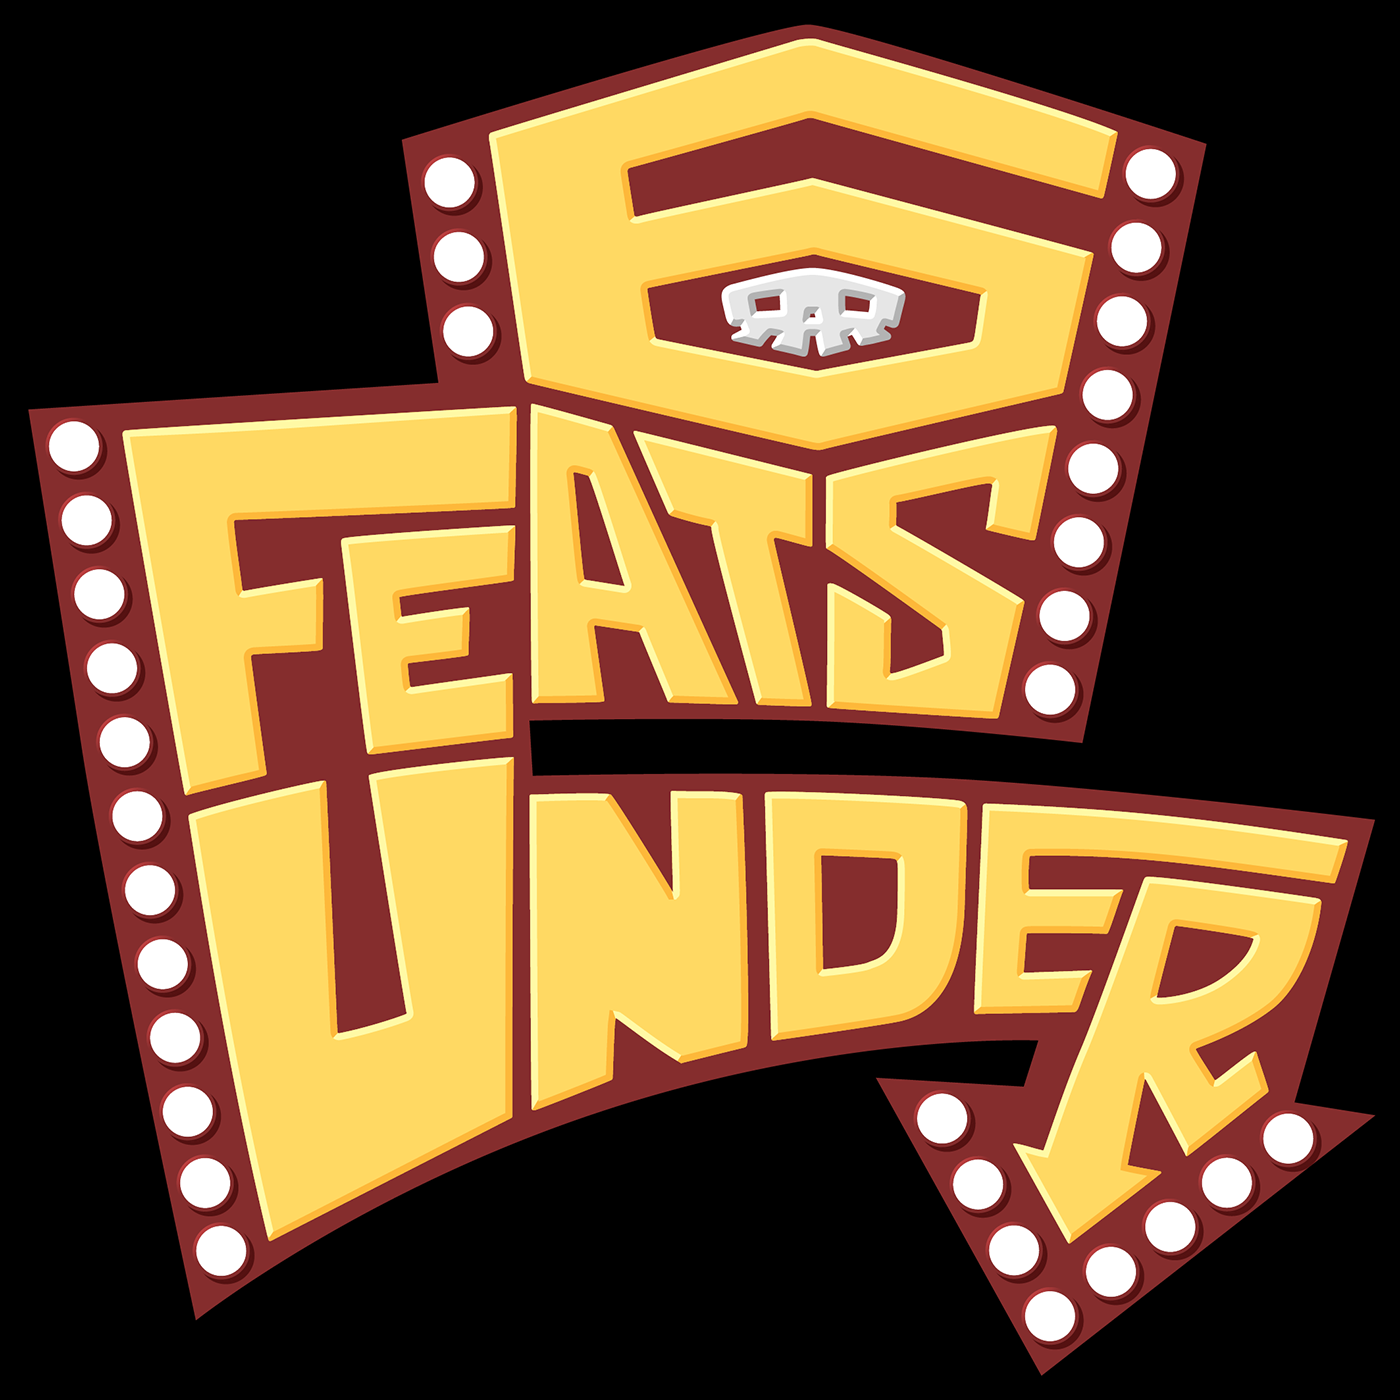 SIX FEATS UNDER  sc 1 st  six feats under - Podbean & Costume Fairy Adventures 2-1: Three Berry Pie!